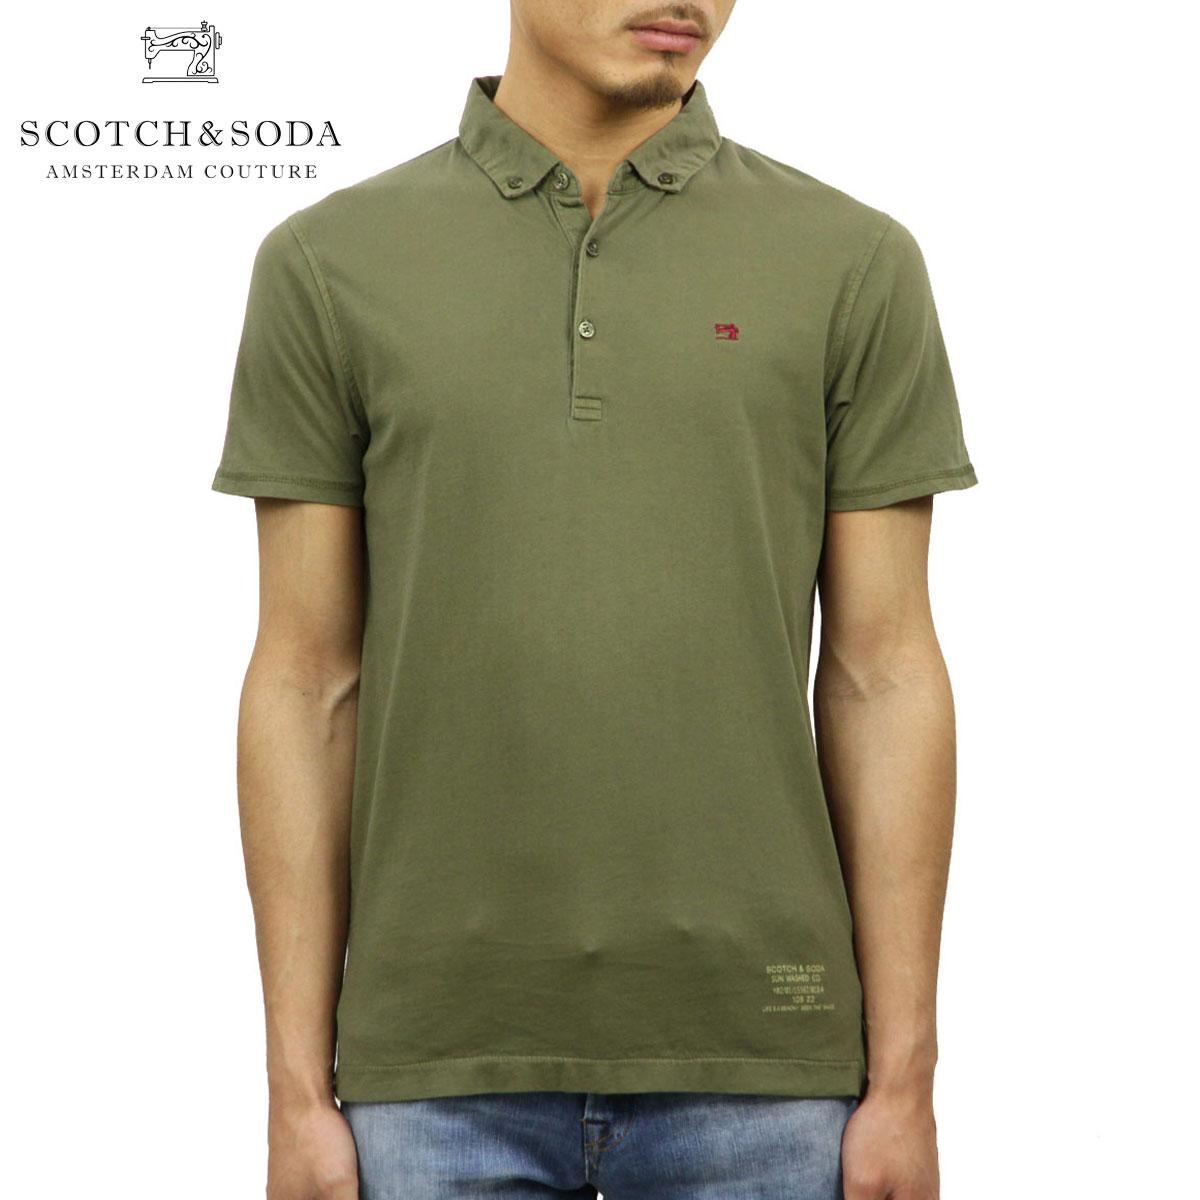 ea1acb38 Scotch Whiskey and soda SCOTCH & SODA regular store men short sleeves polo  shirt CLASSIC ...